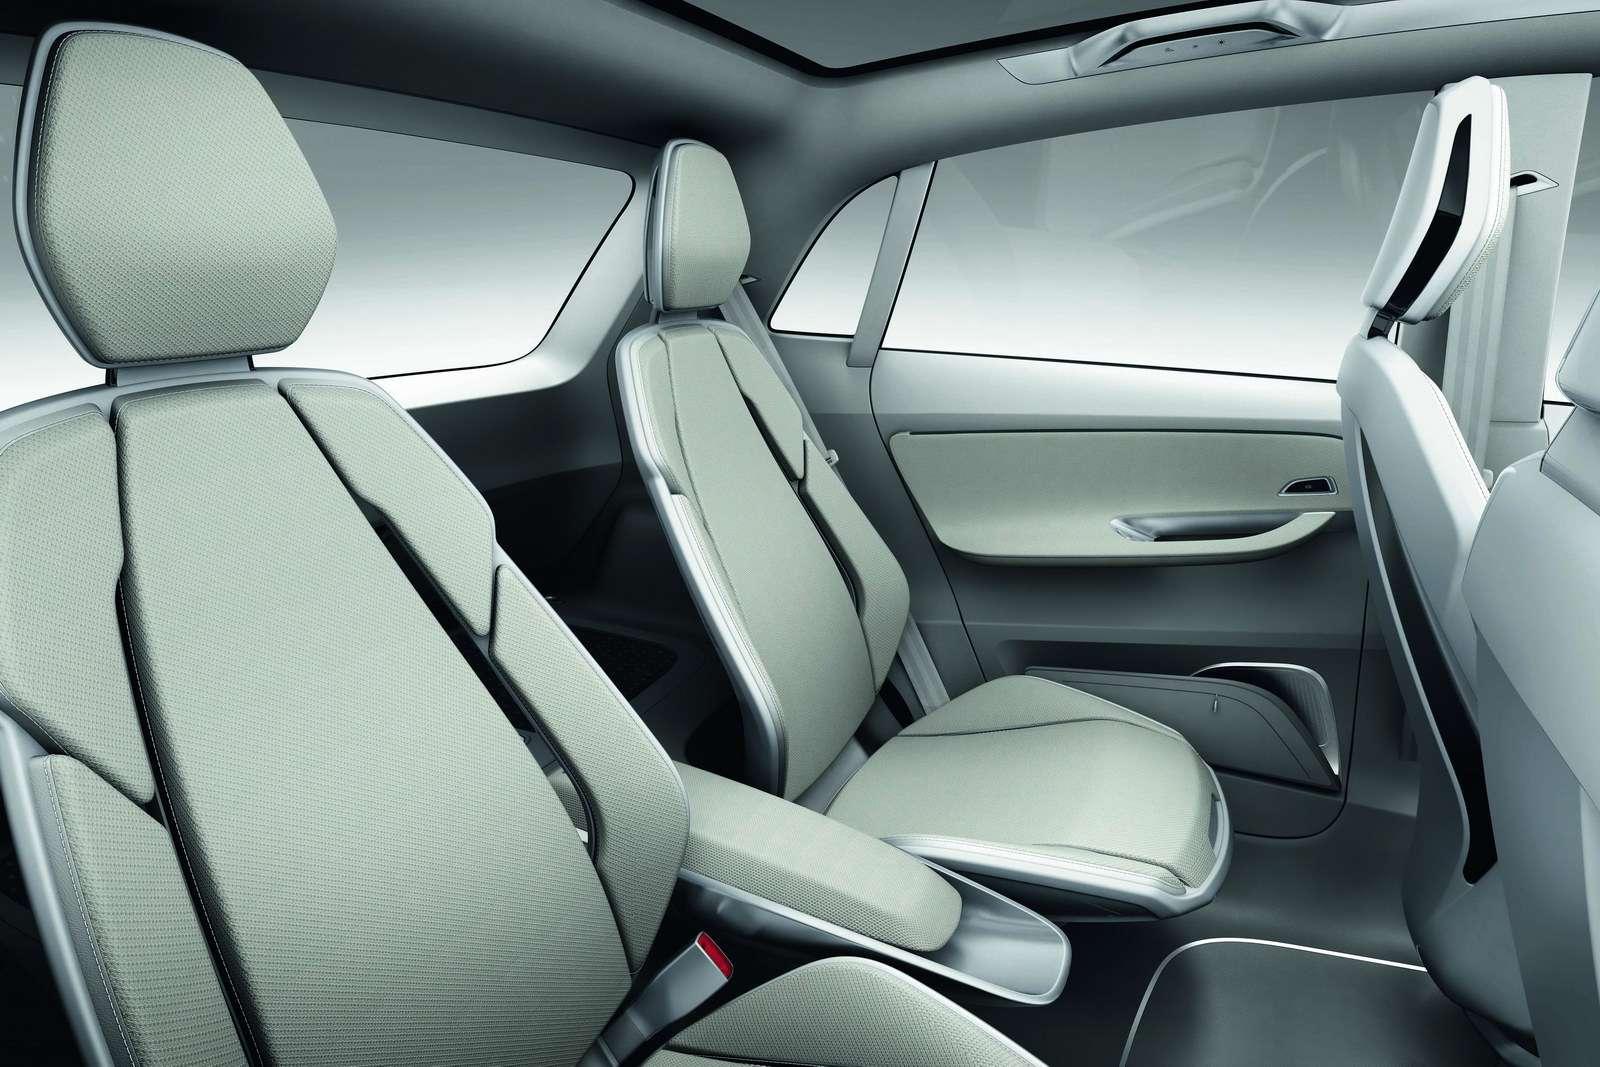 Audi A2 Concept first photo wrzesien 2011